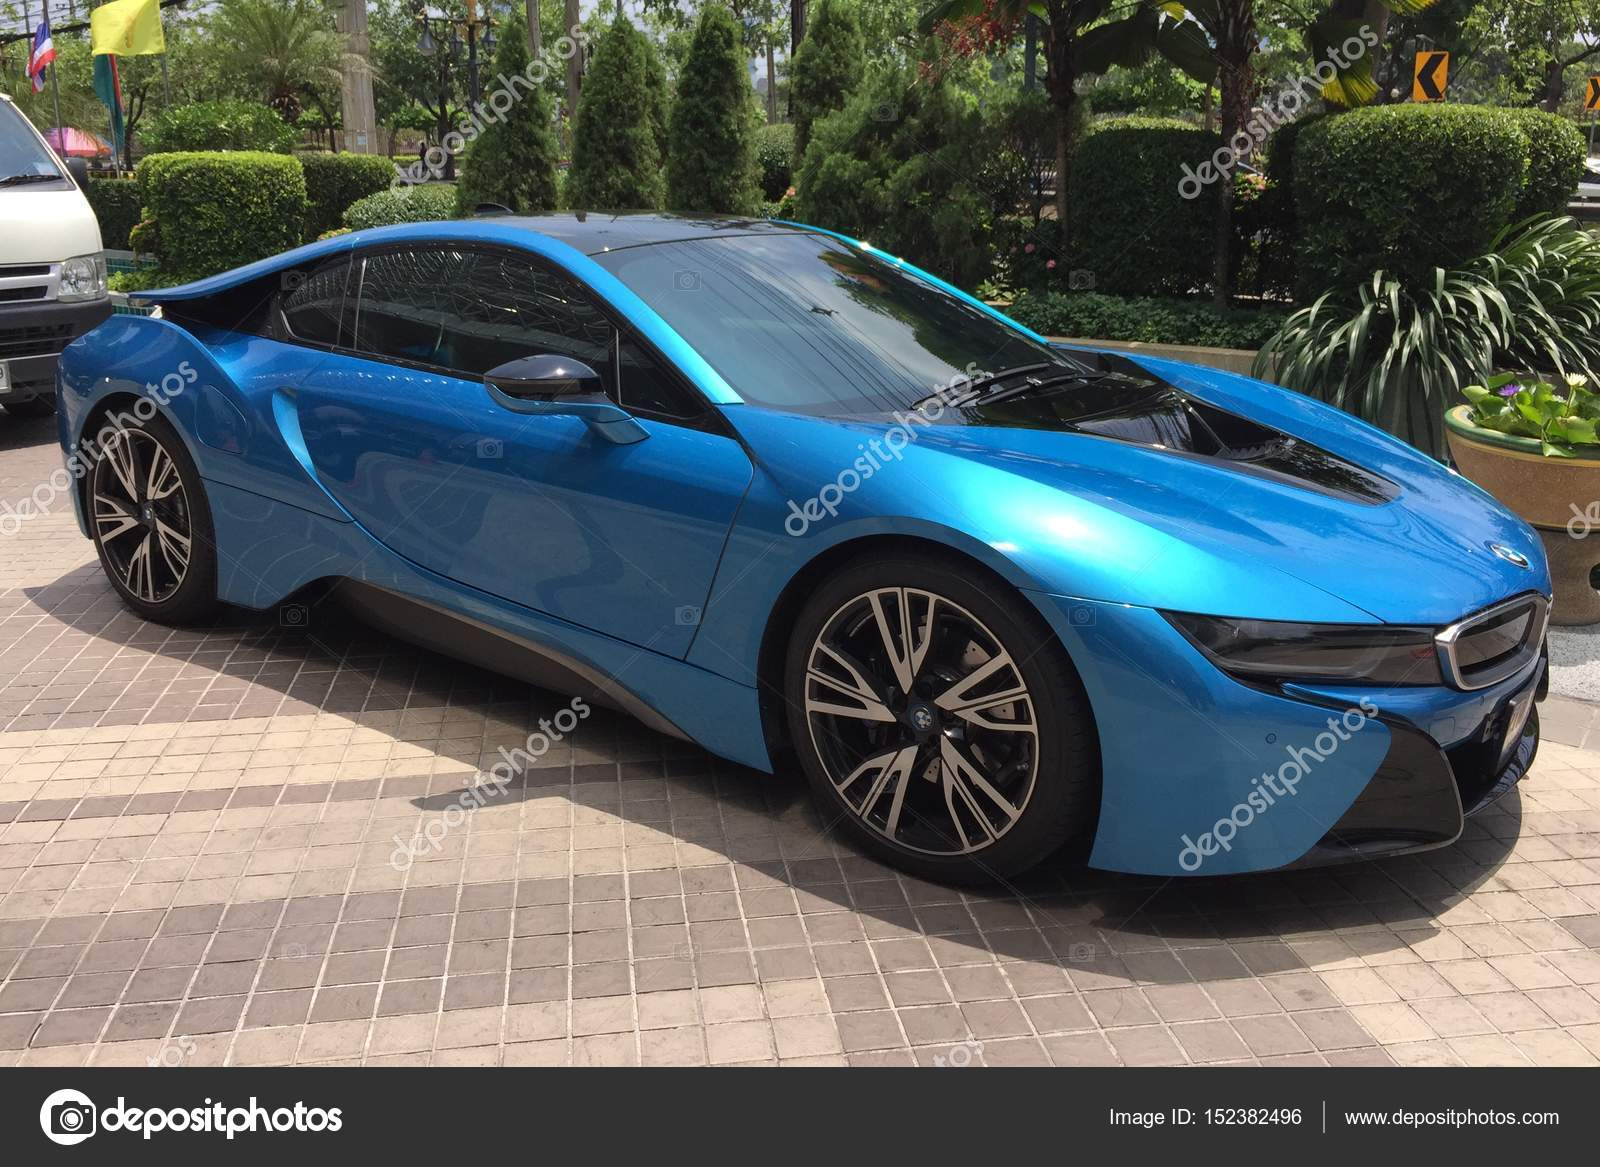 Bmw I8 Concepto Electrico Vehiculo Coche En La Carretera Foto